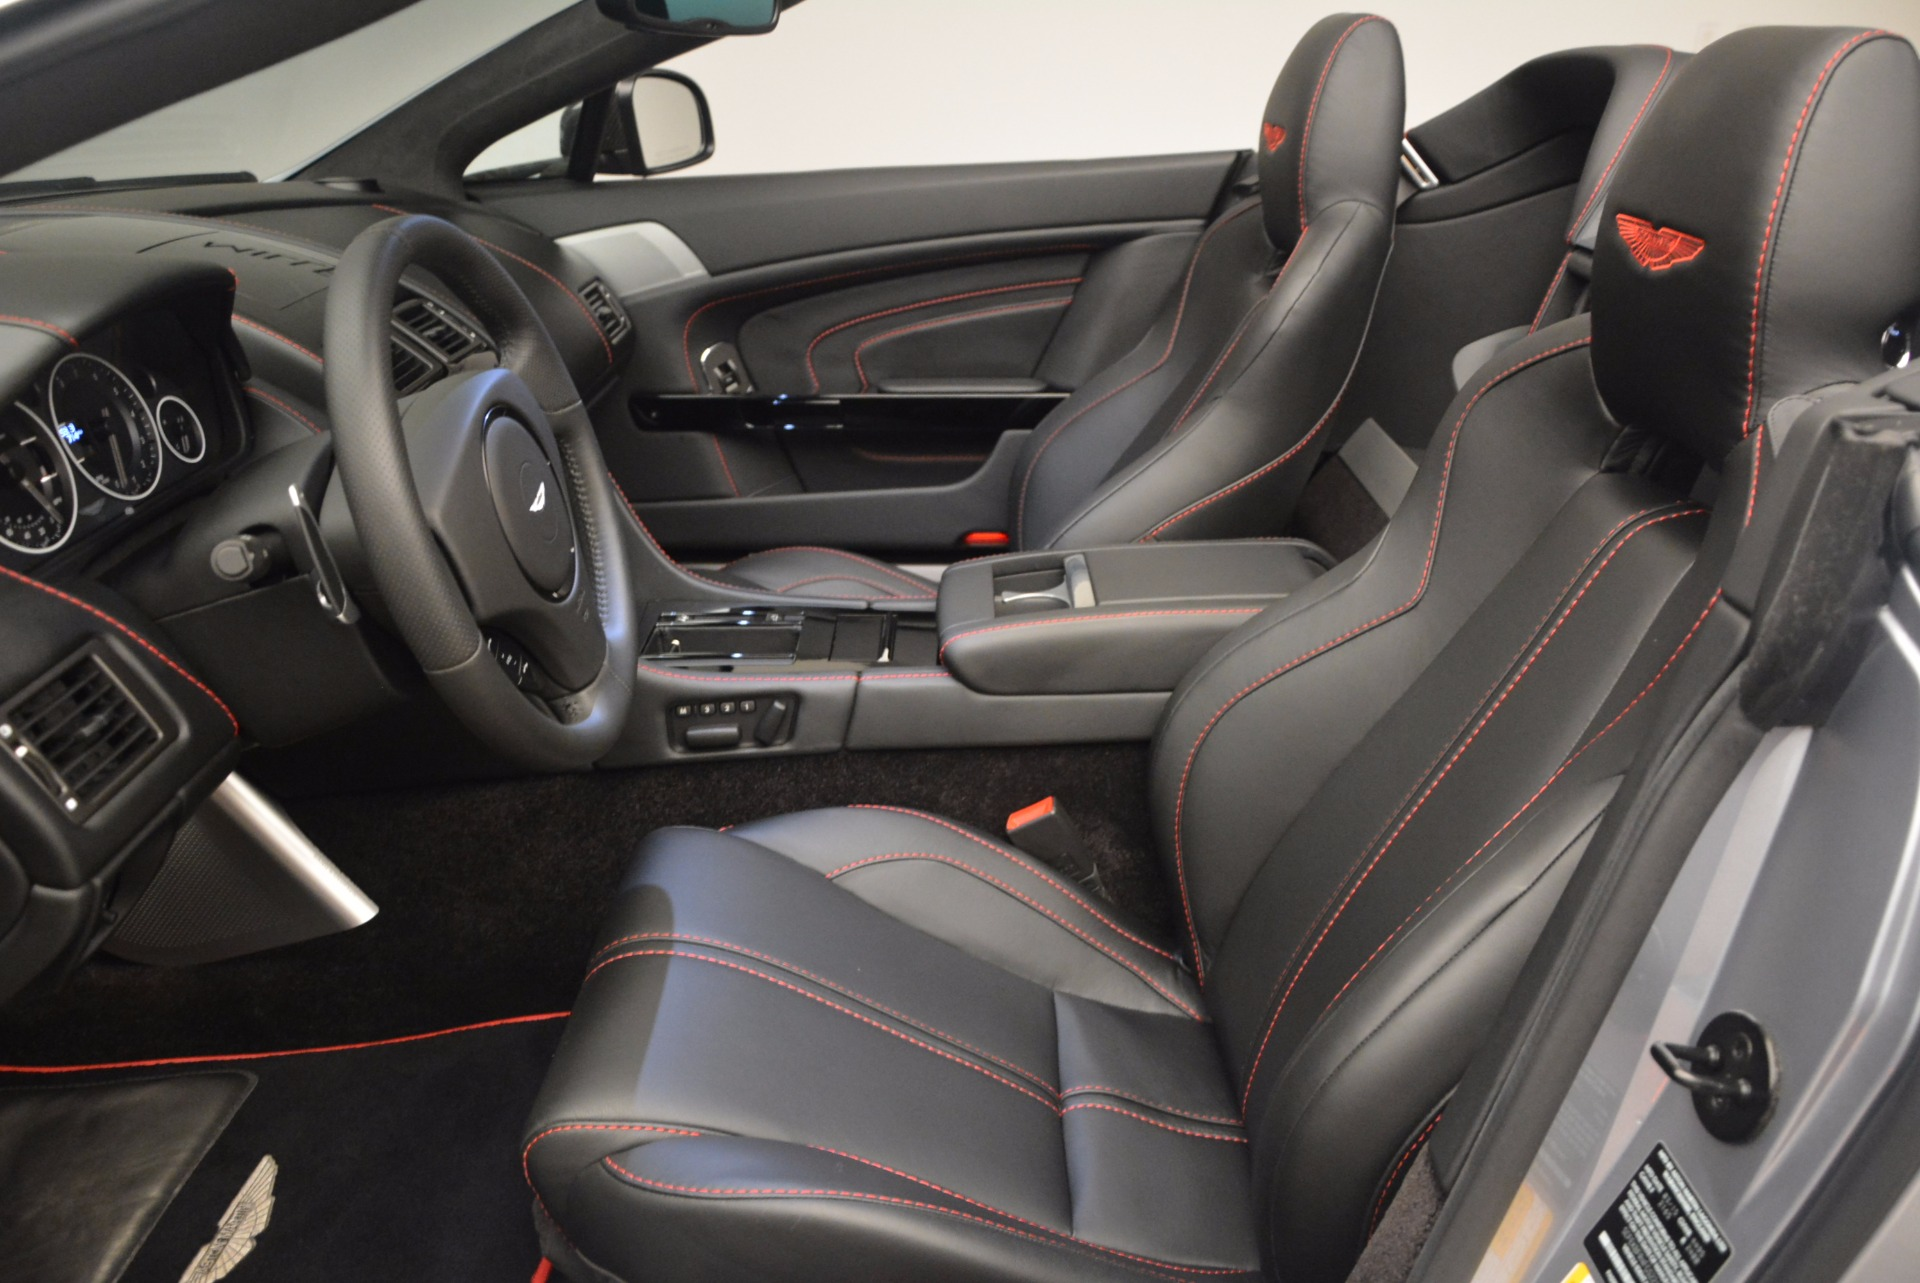 Used 2015 Aston Martin V12 Vantage S Roadster For Sale In Westport, CT 1130_p24